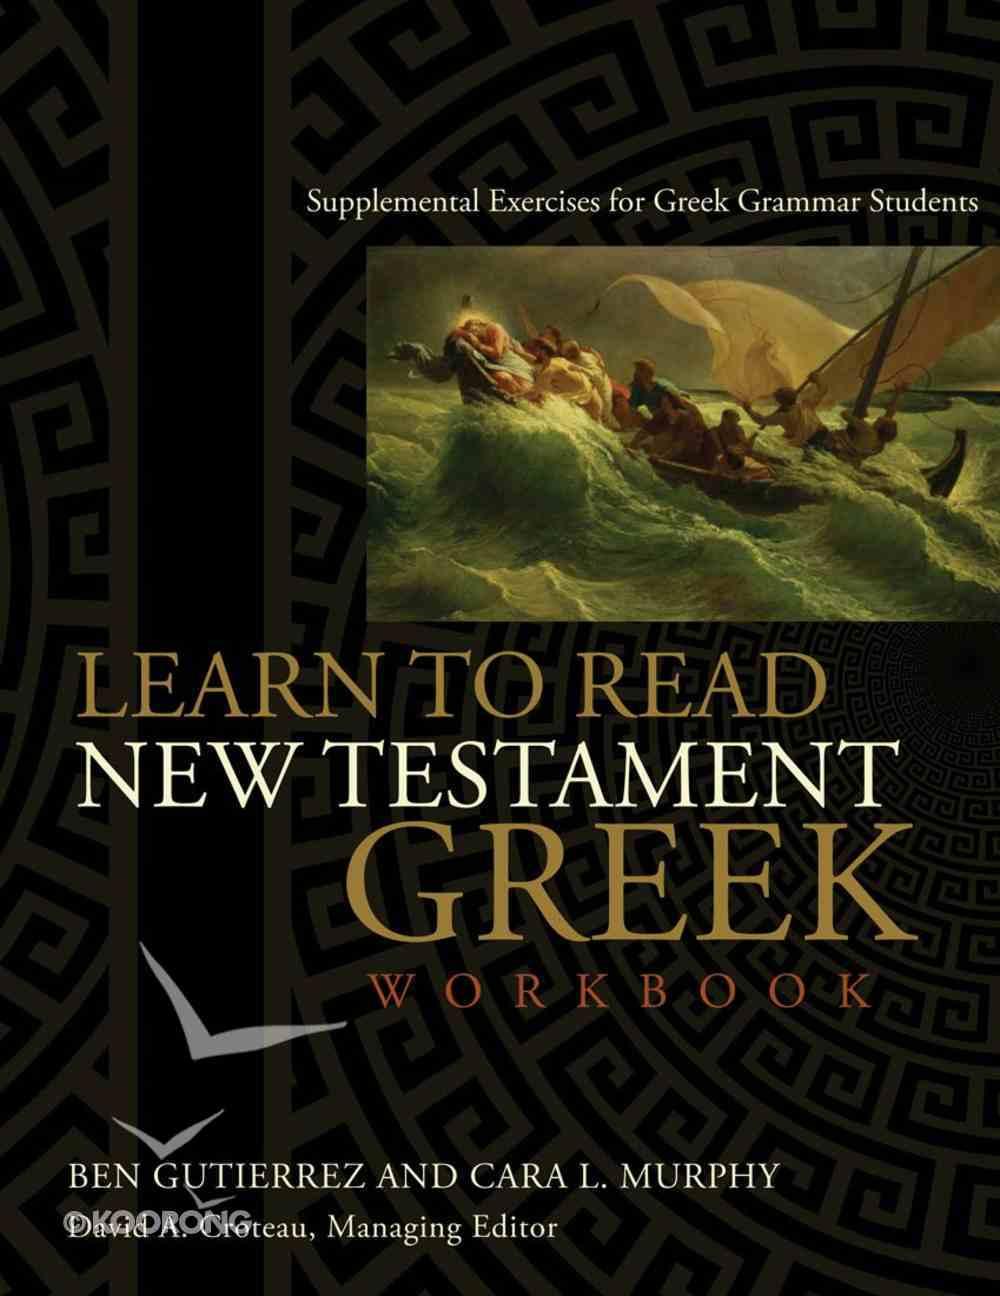 Learn to Read New Testament Greek Workbook eBook